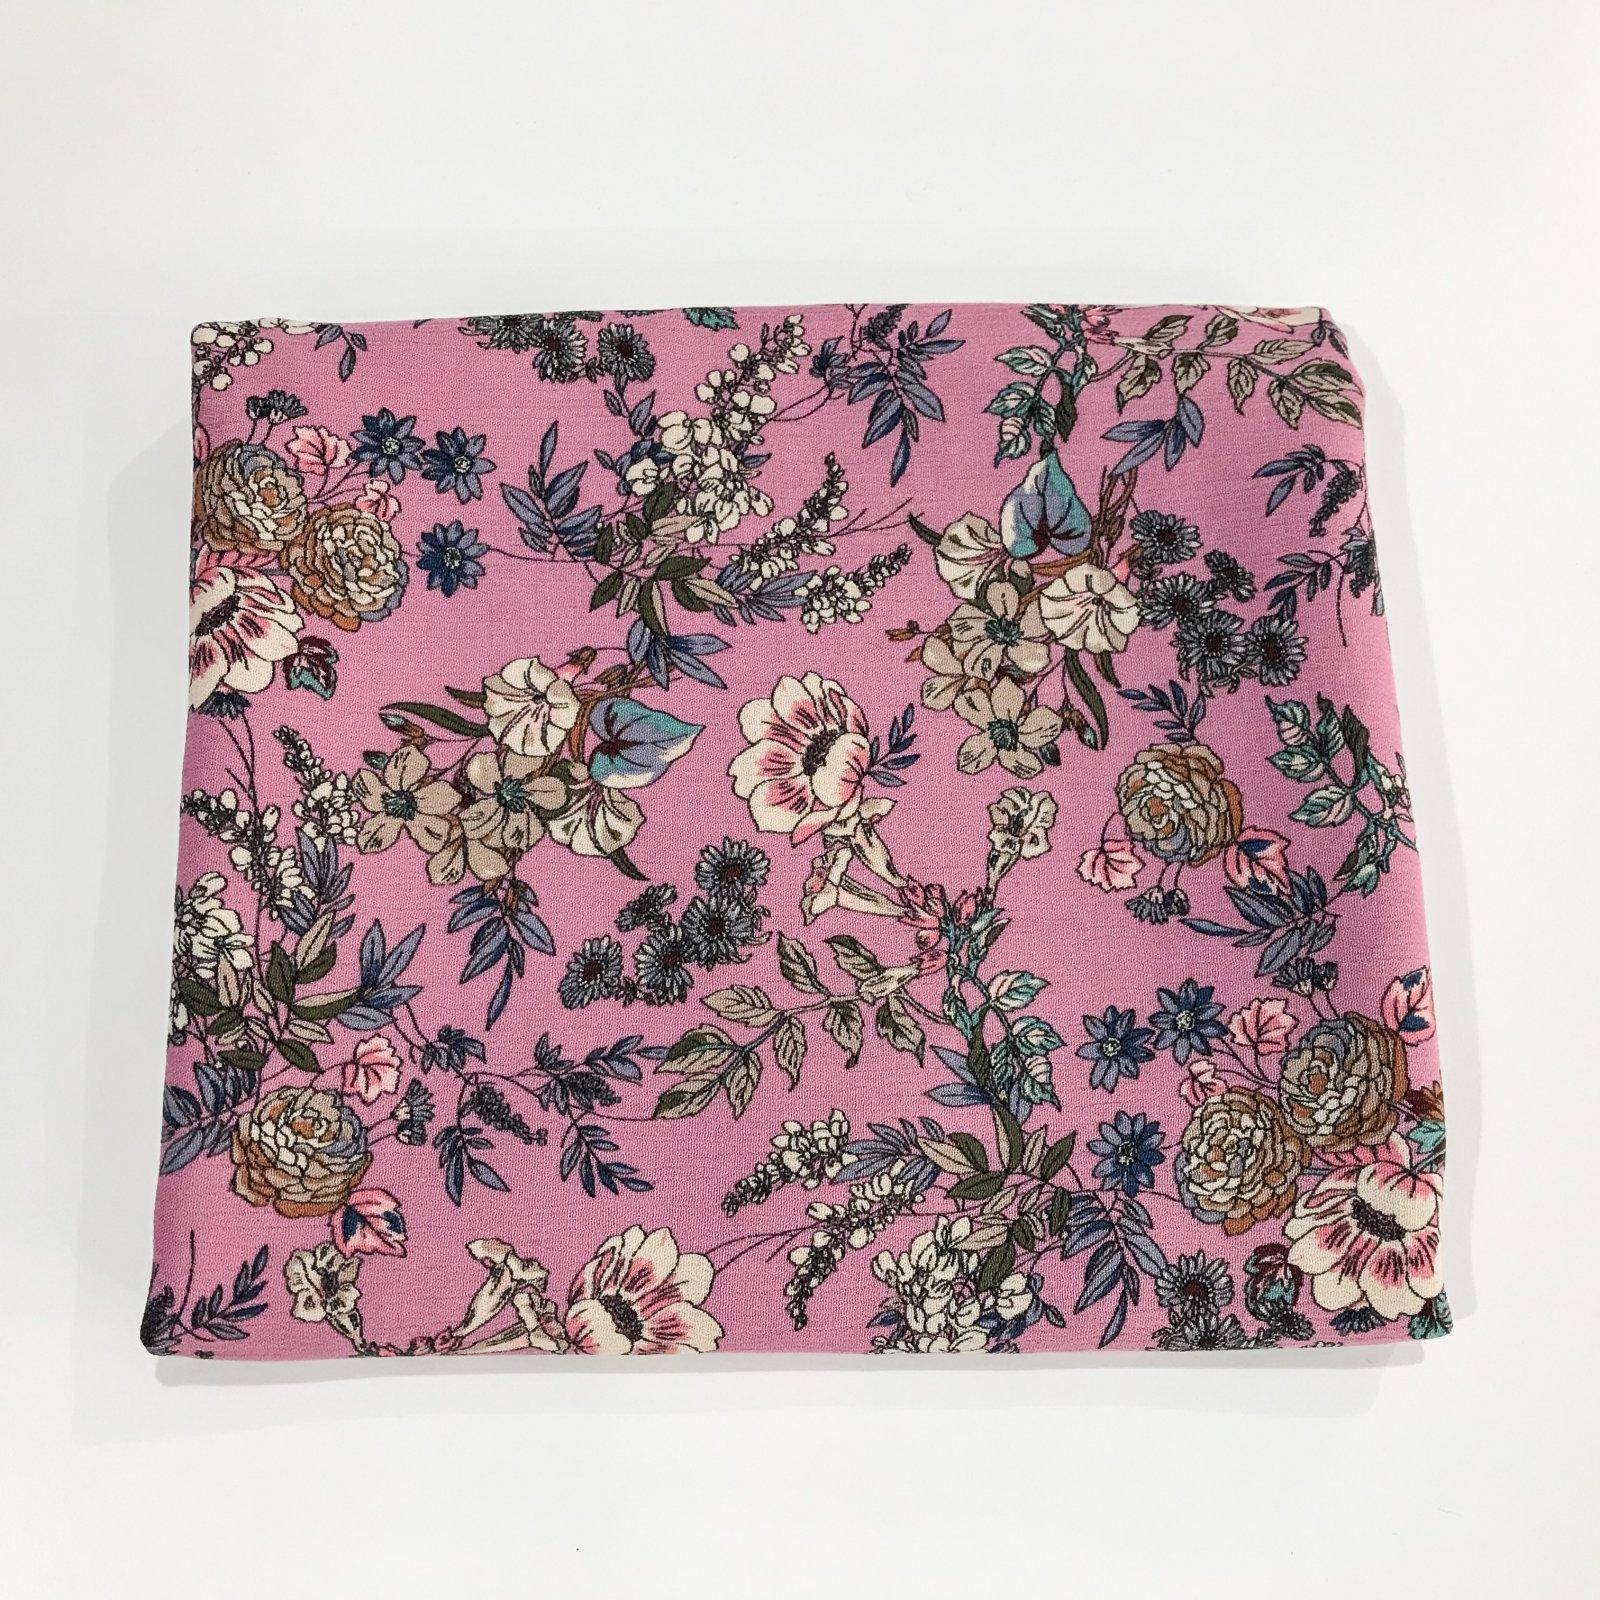 1 5/8 yards - Rayon Crepe - Boho Floral in Pink